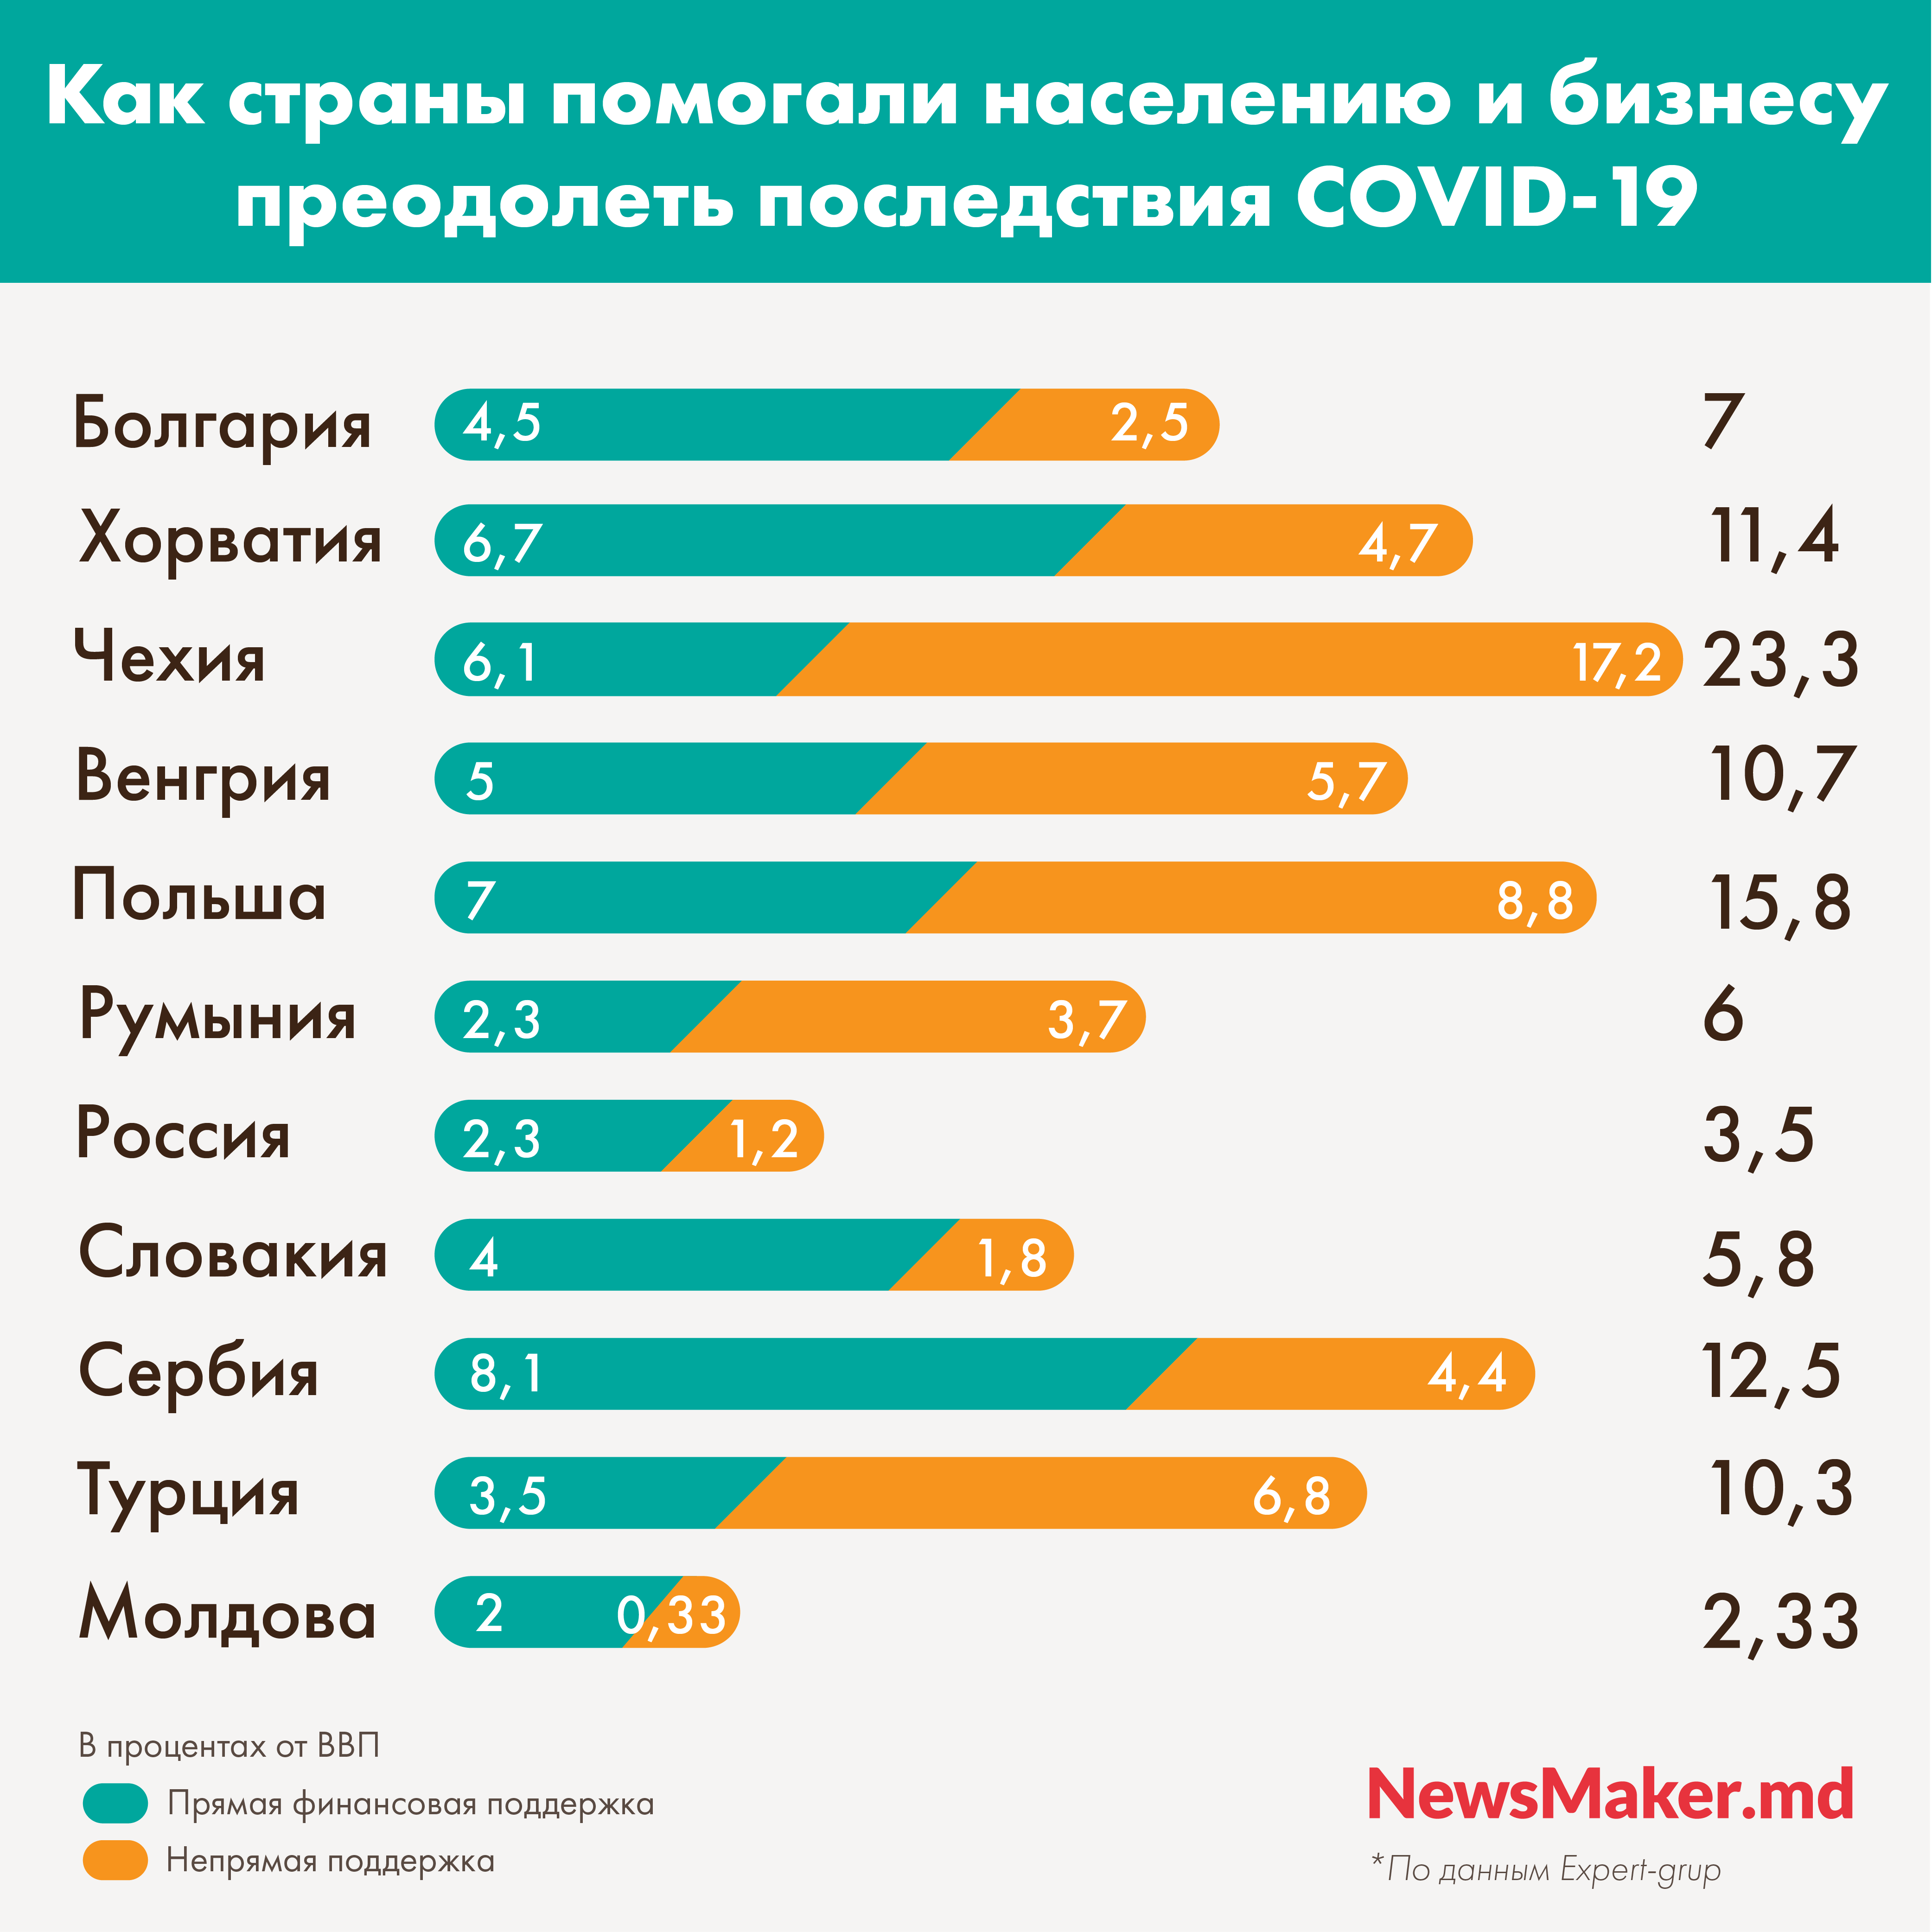 Коронакризис-2021. Как власти Молдовы могут помочь людям и бизнесу